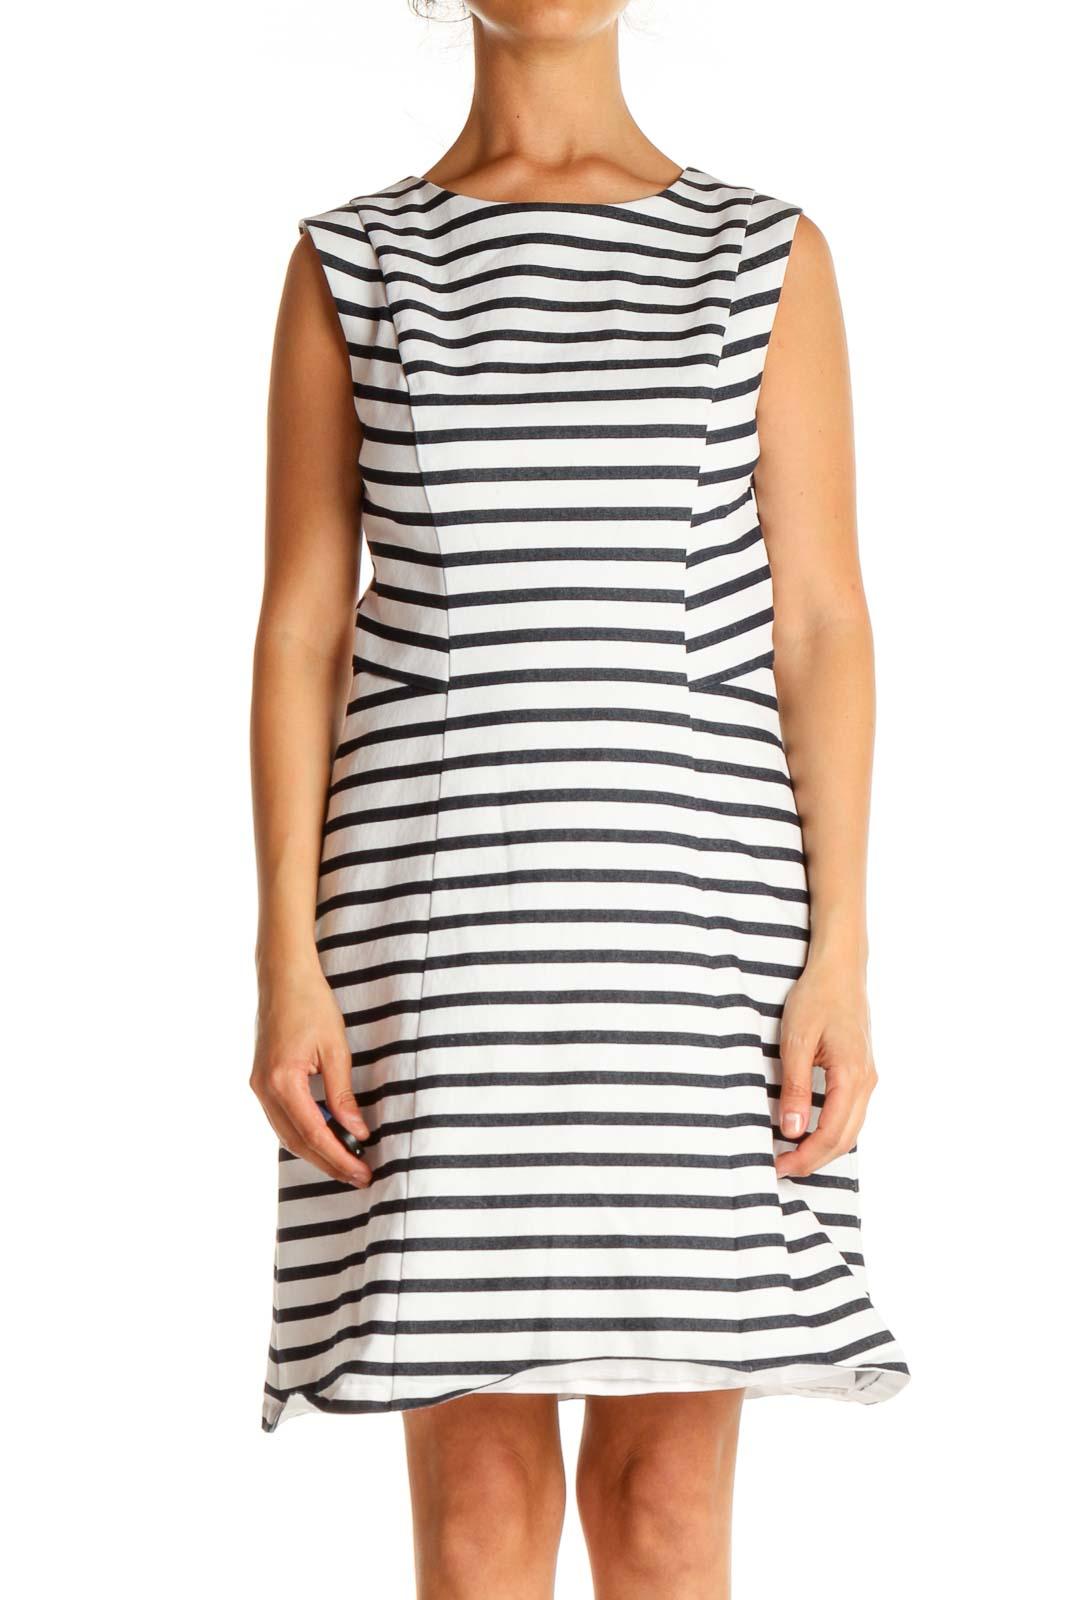 White Striped Day Sheath Dress Front